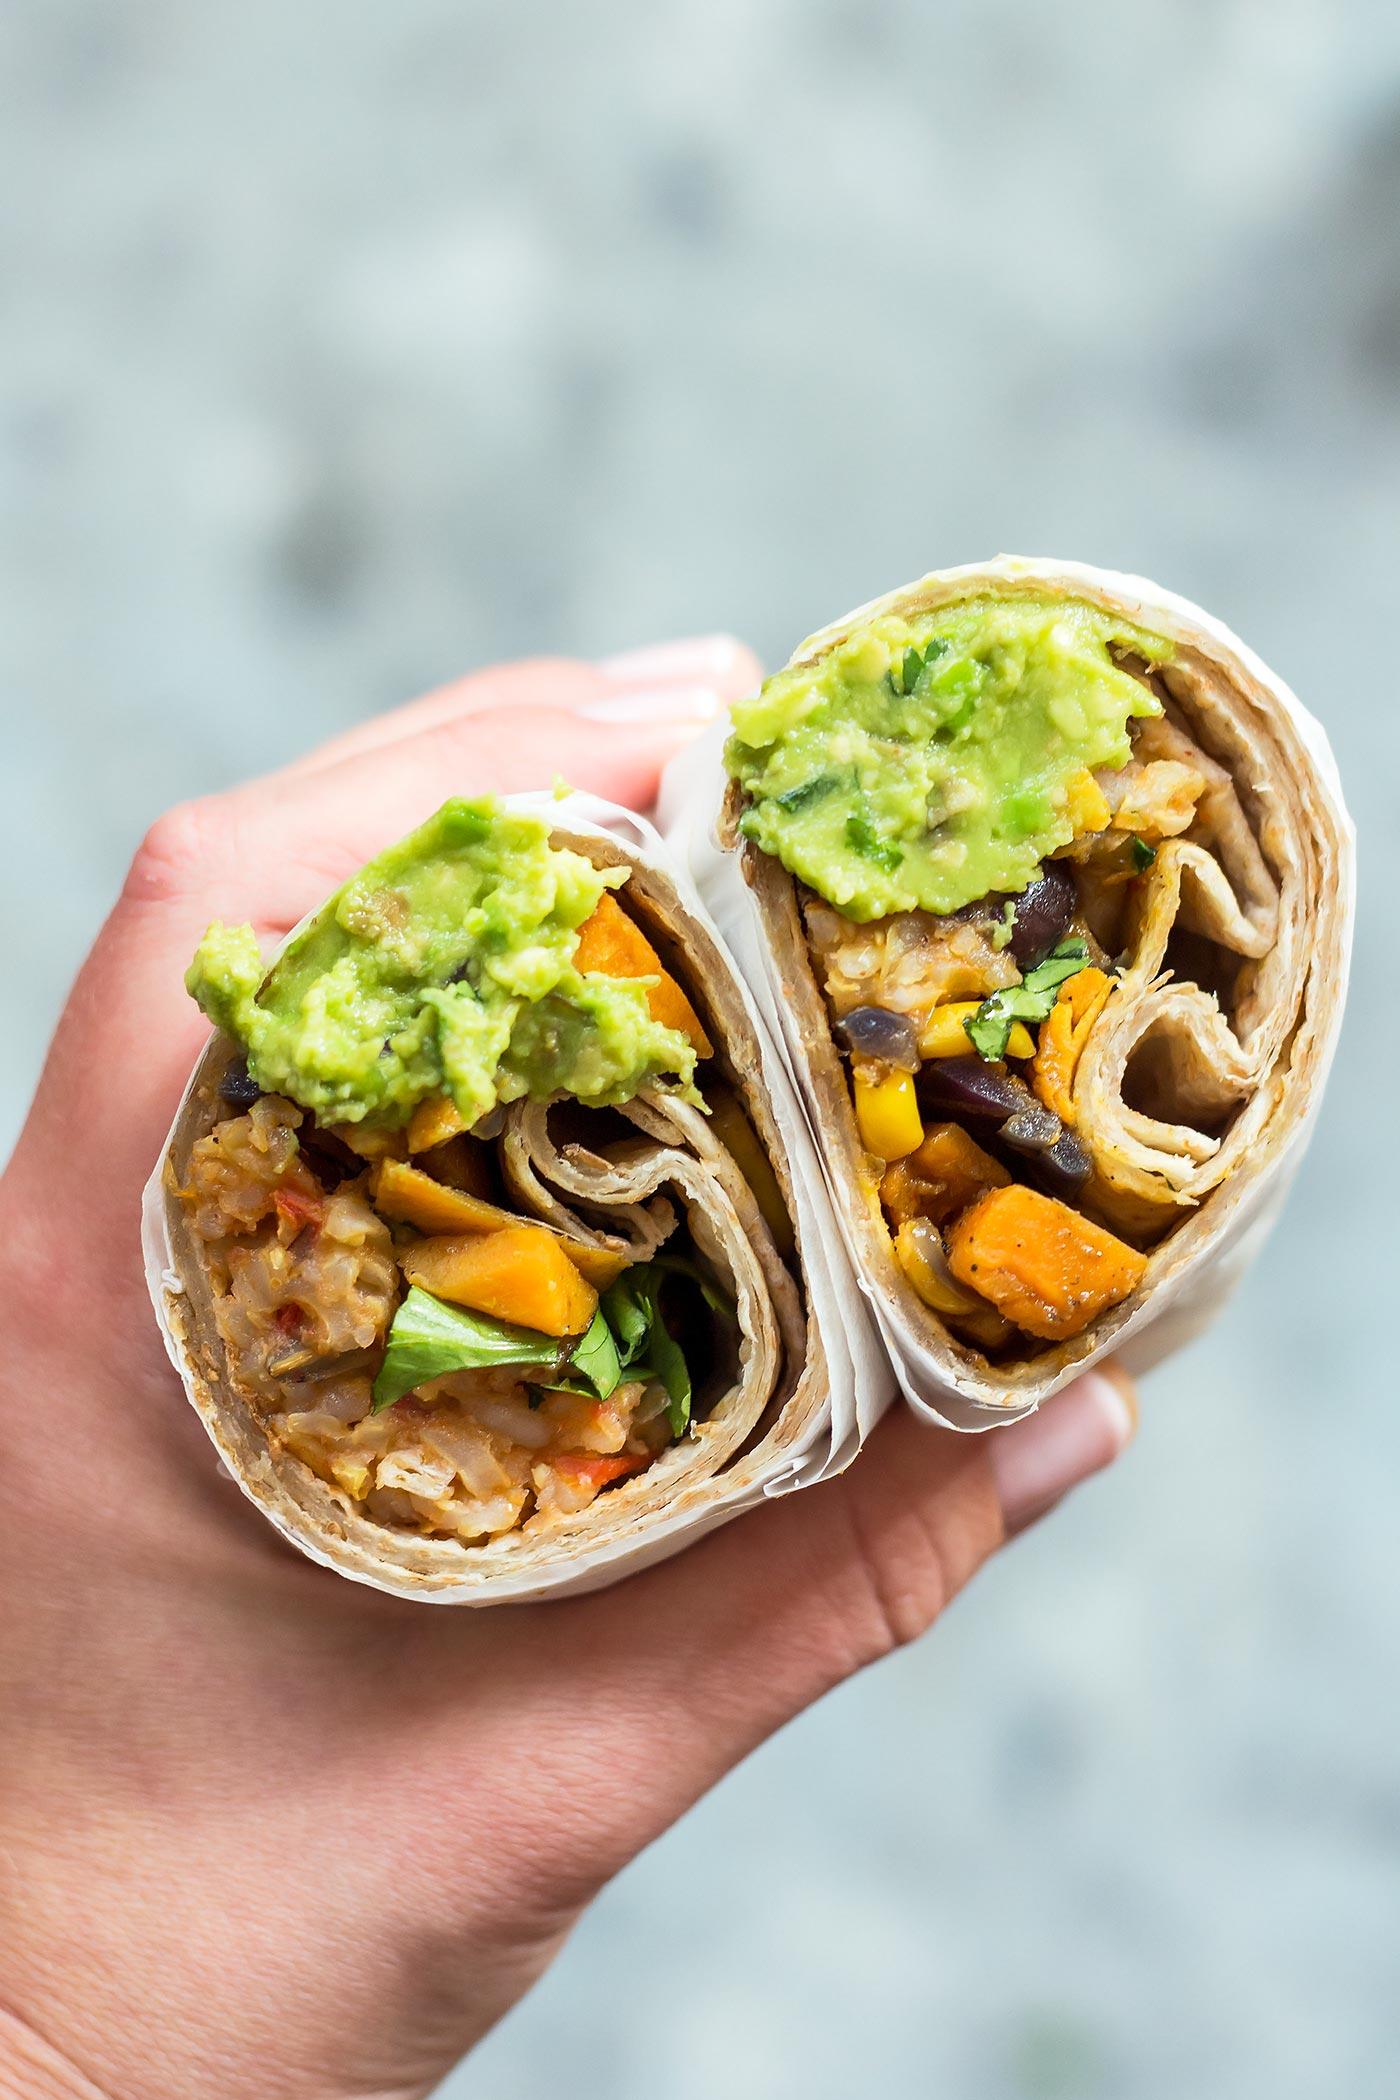 Holding vegan burrito with guacamole